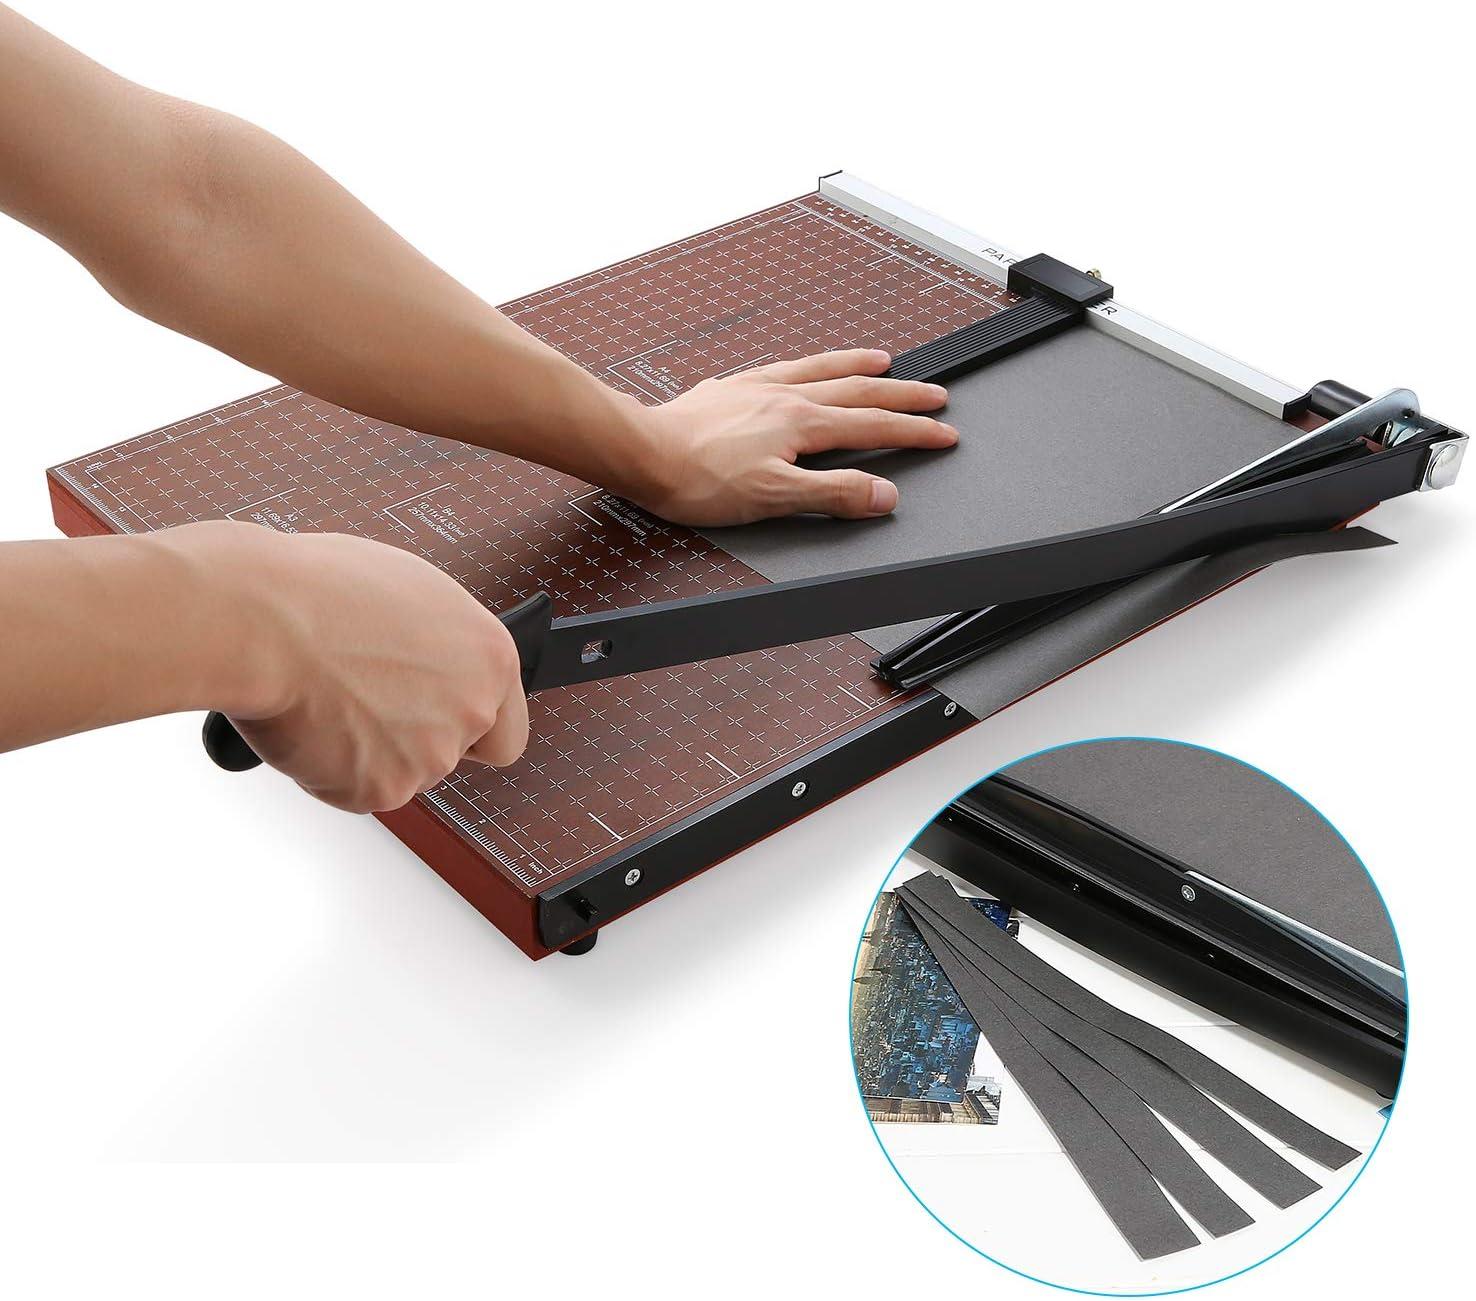 485 x 385mm Schnittl/änge 650mm A3 Papierschneider Fotoschneider Hebelschneider Papierschneidemaschine Schneideger/ät Schrottmaschineider aus Holz